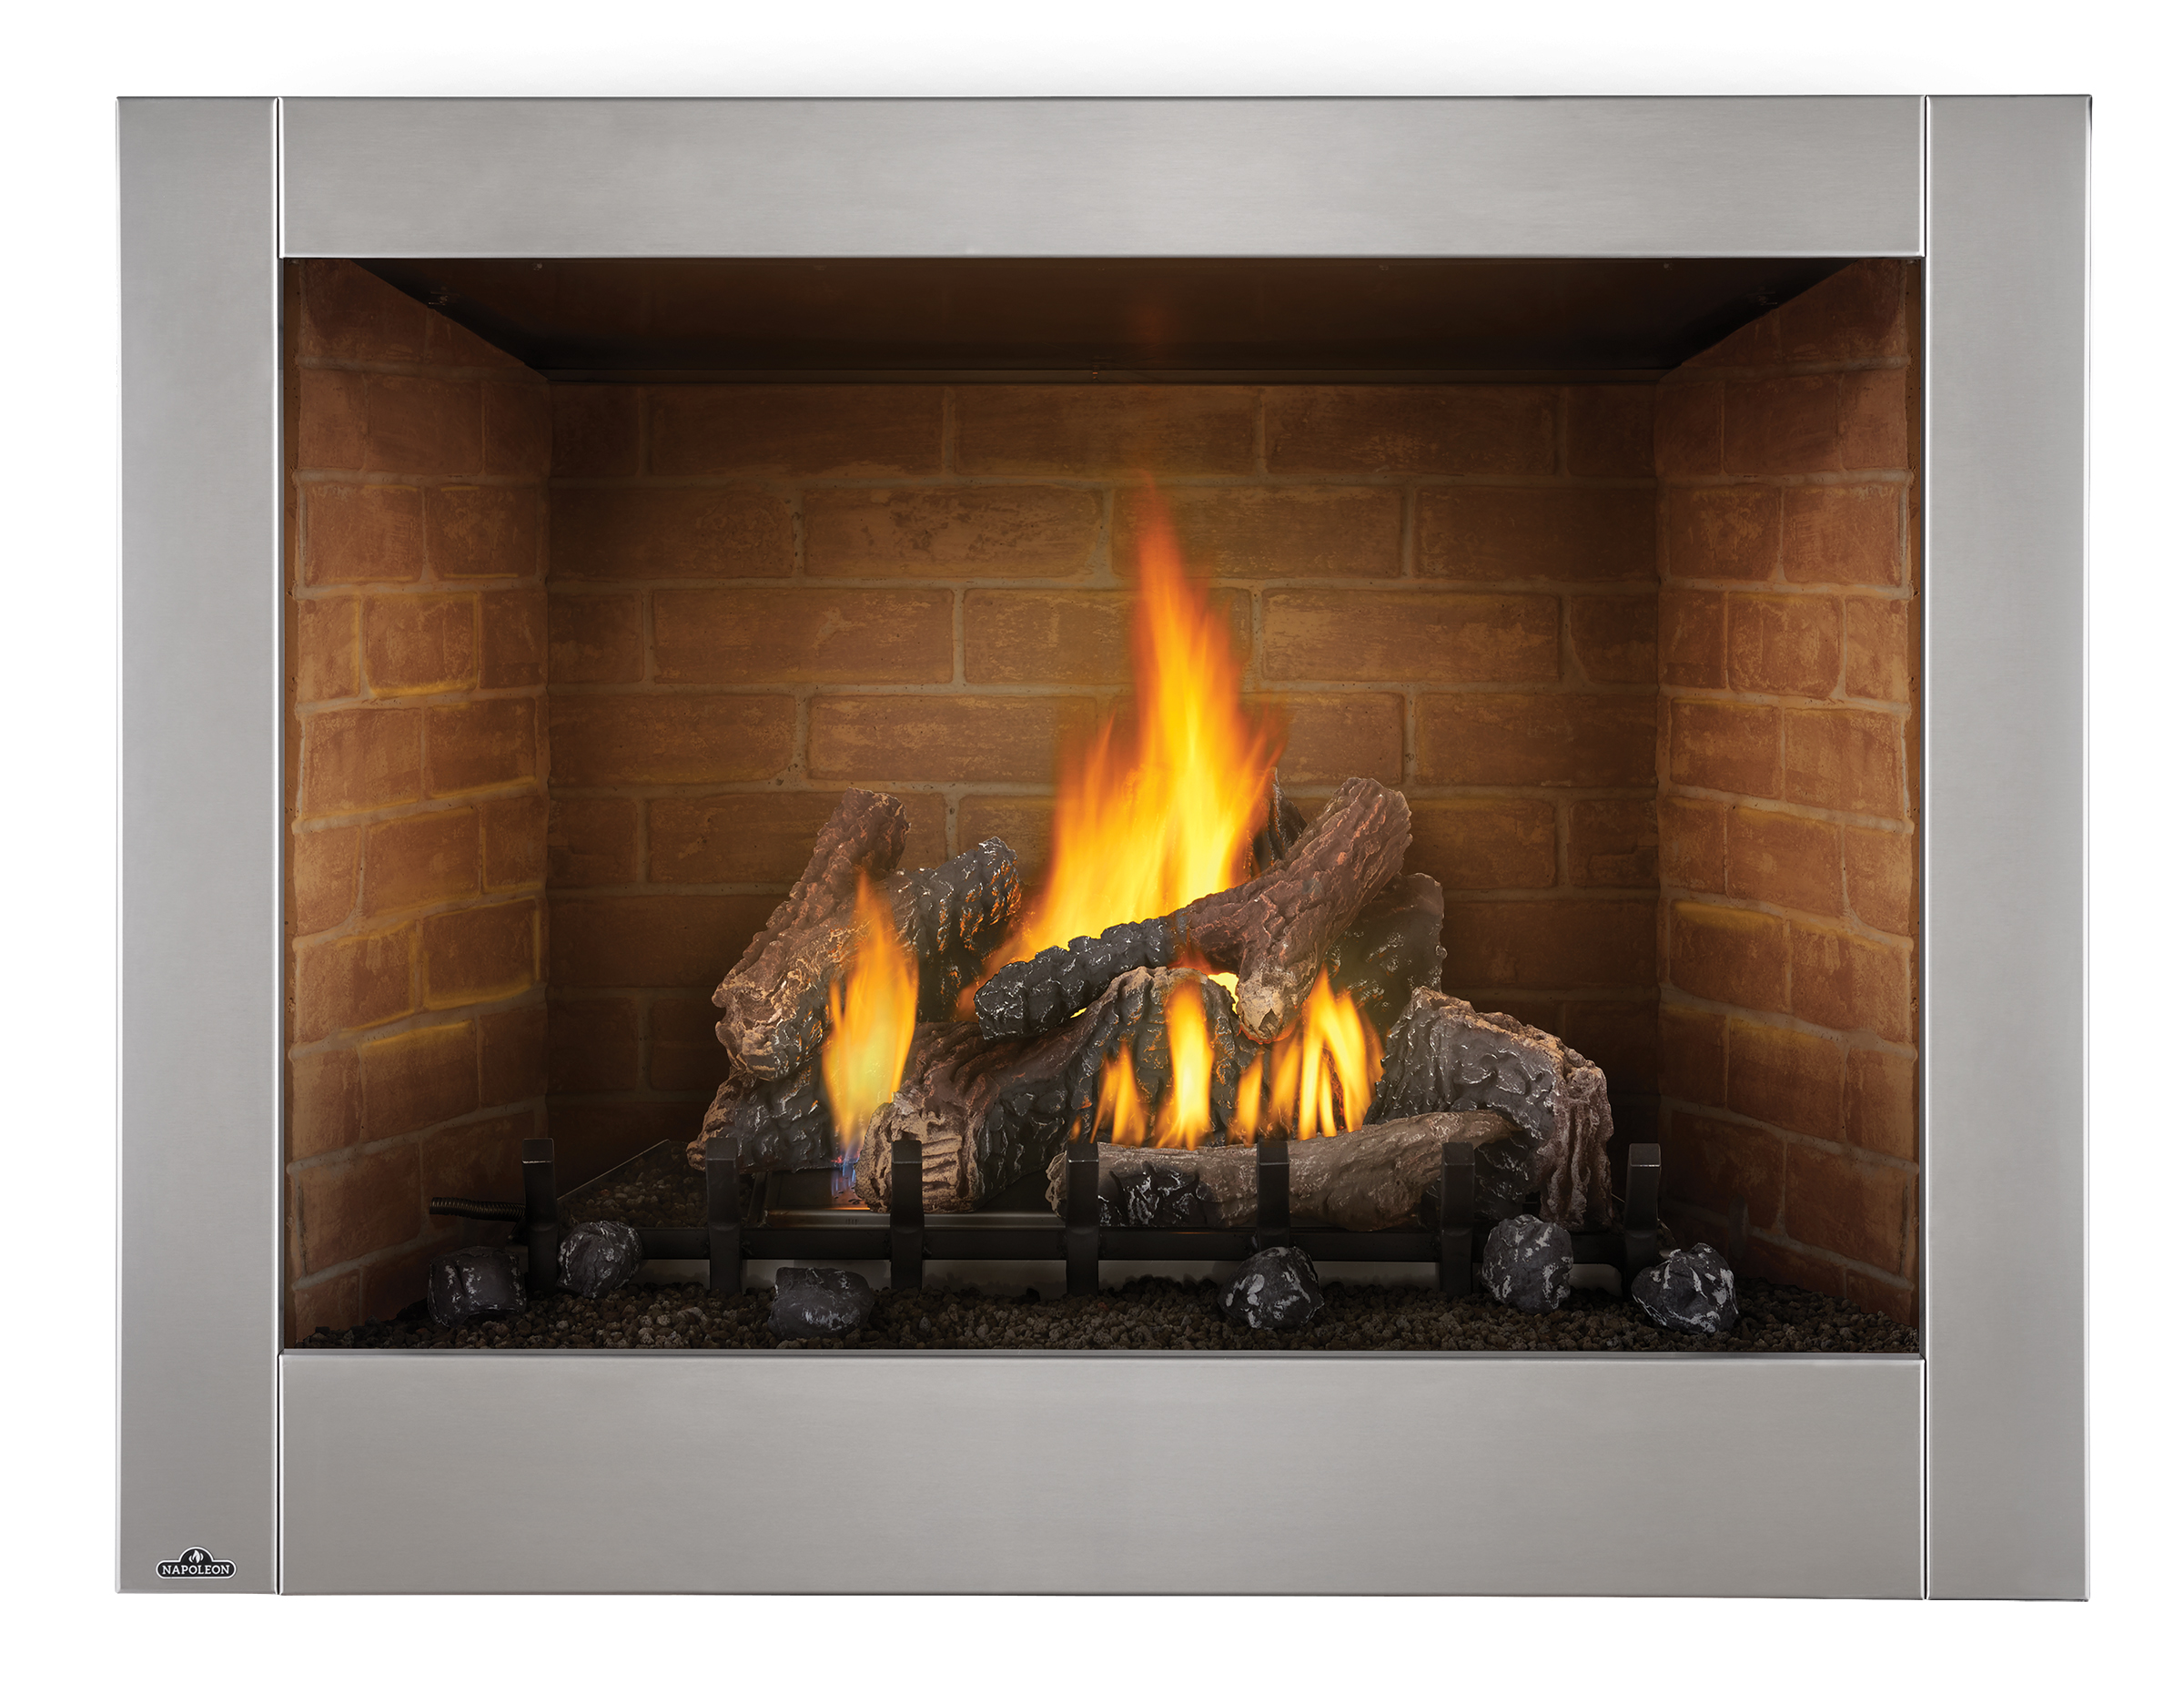 riverside outdoor fireplace gas burning 42 inch. Black Bedroom Furniture Sets. Home Design Ideas